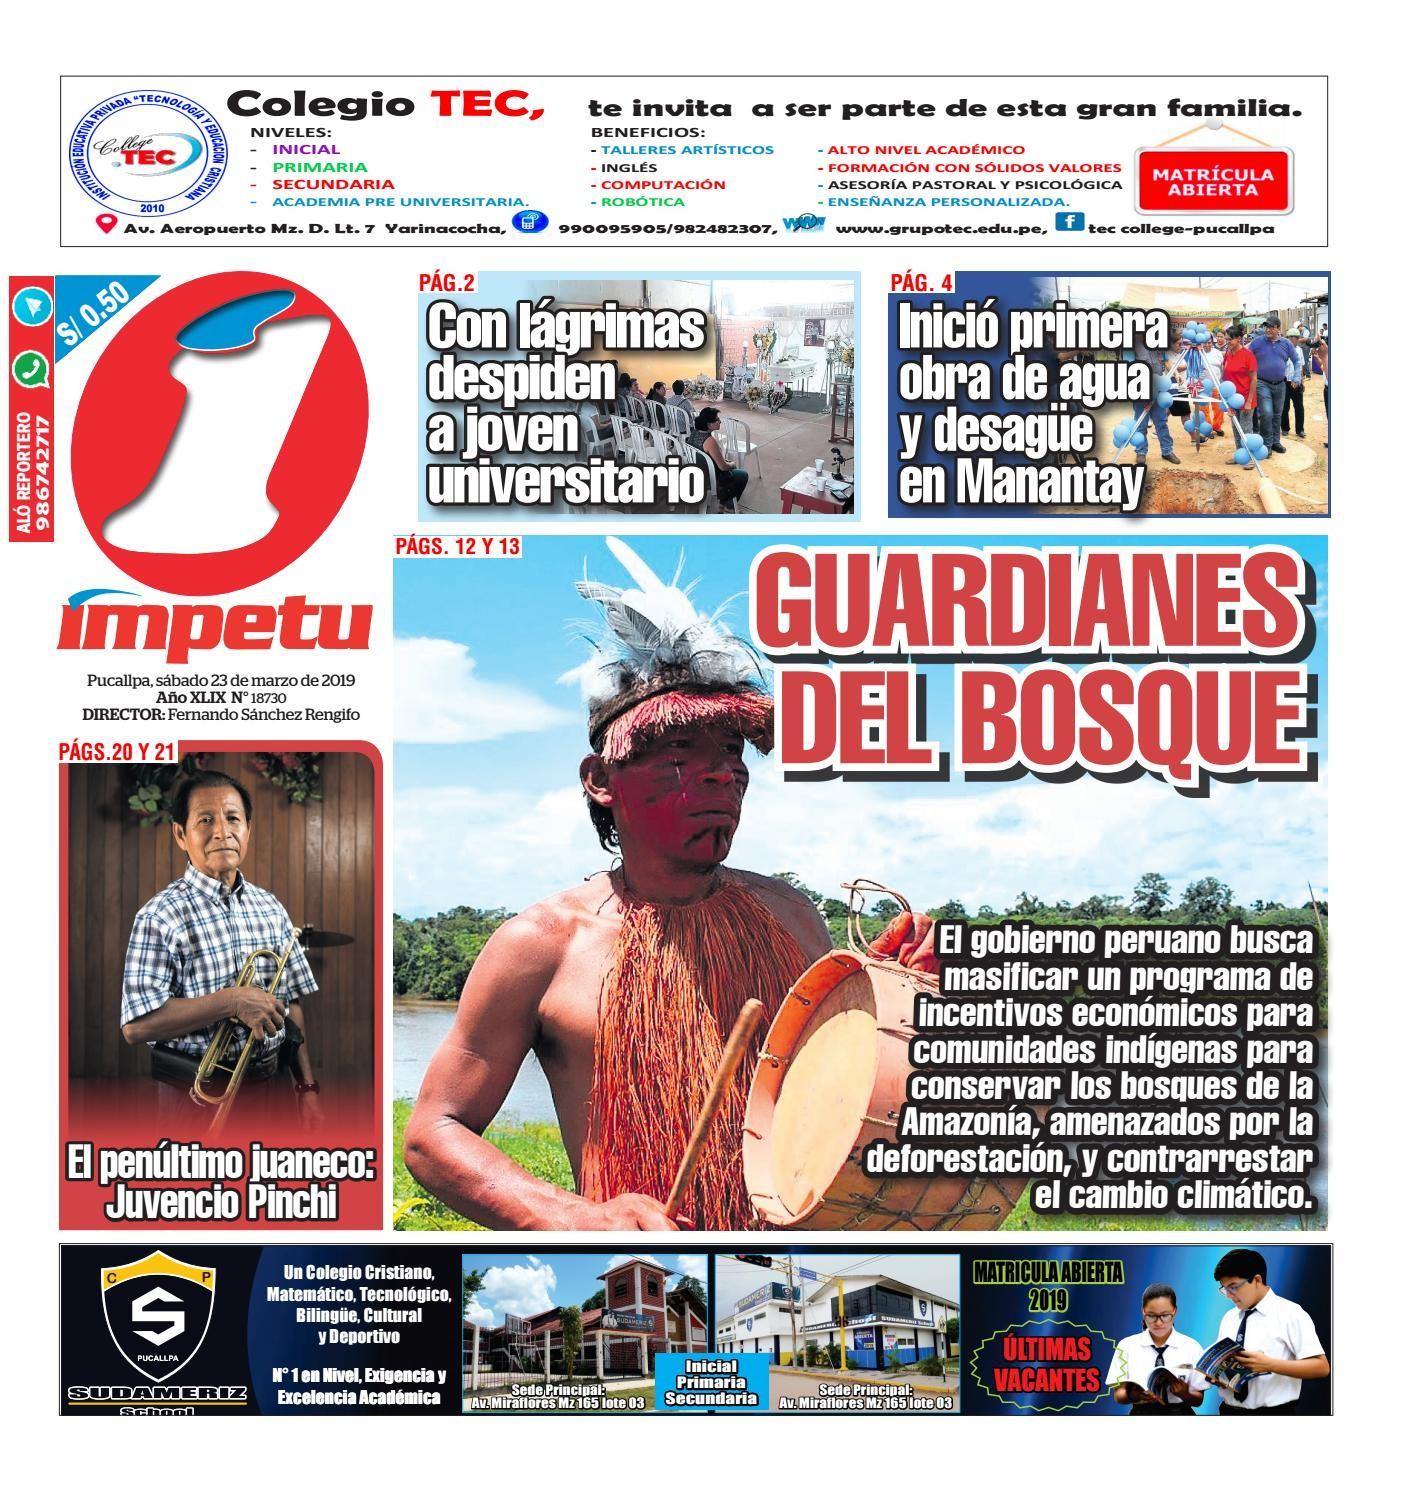 mpetu Pucallpa 23 de marzo de 2019 by Diario mpetu issuu